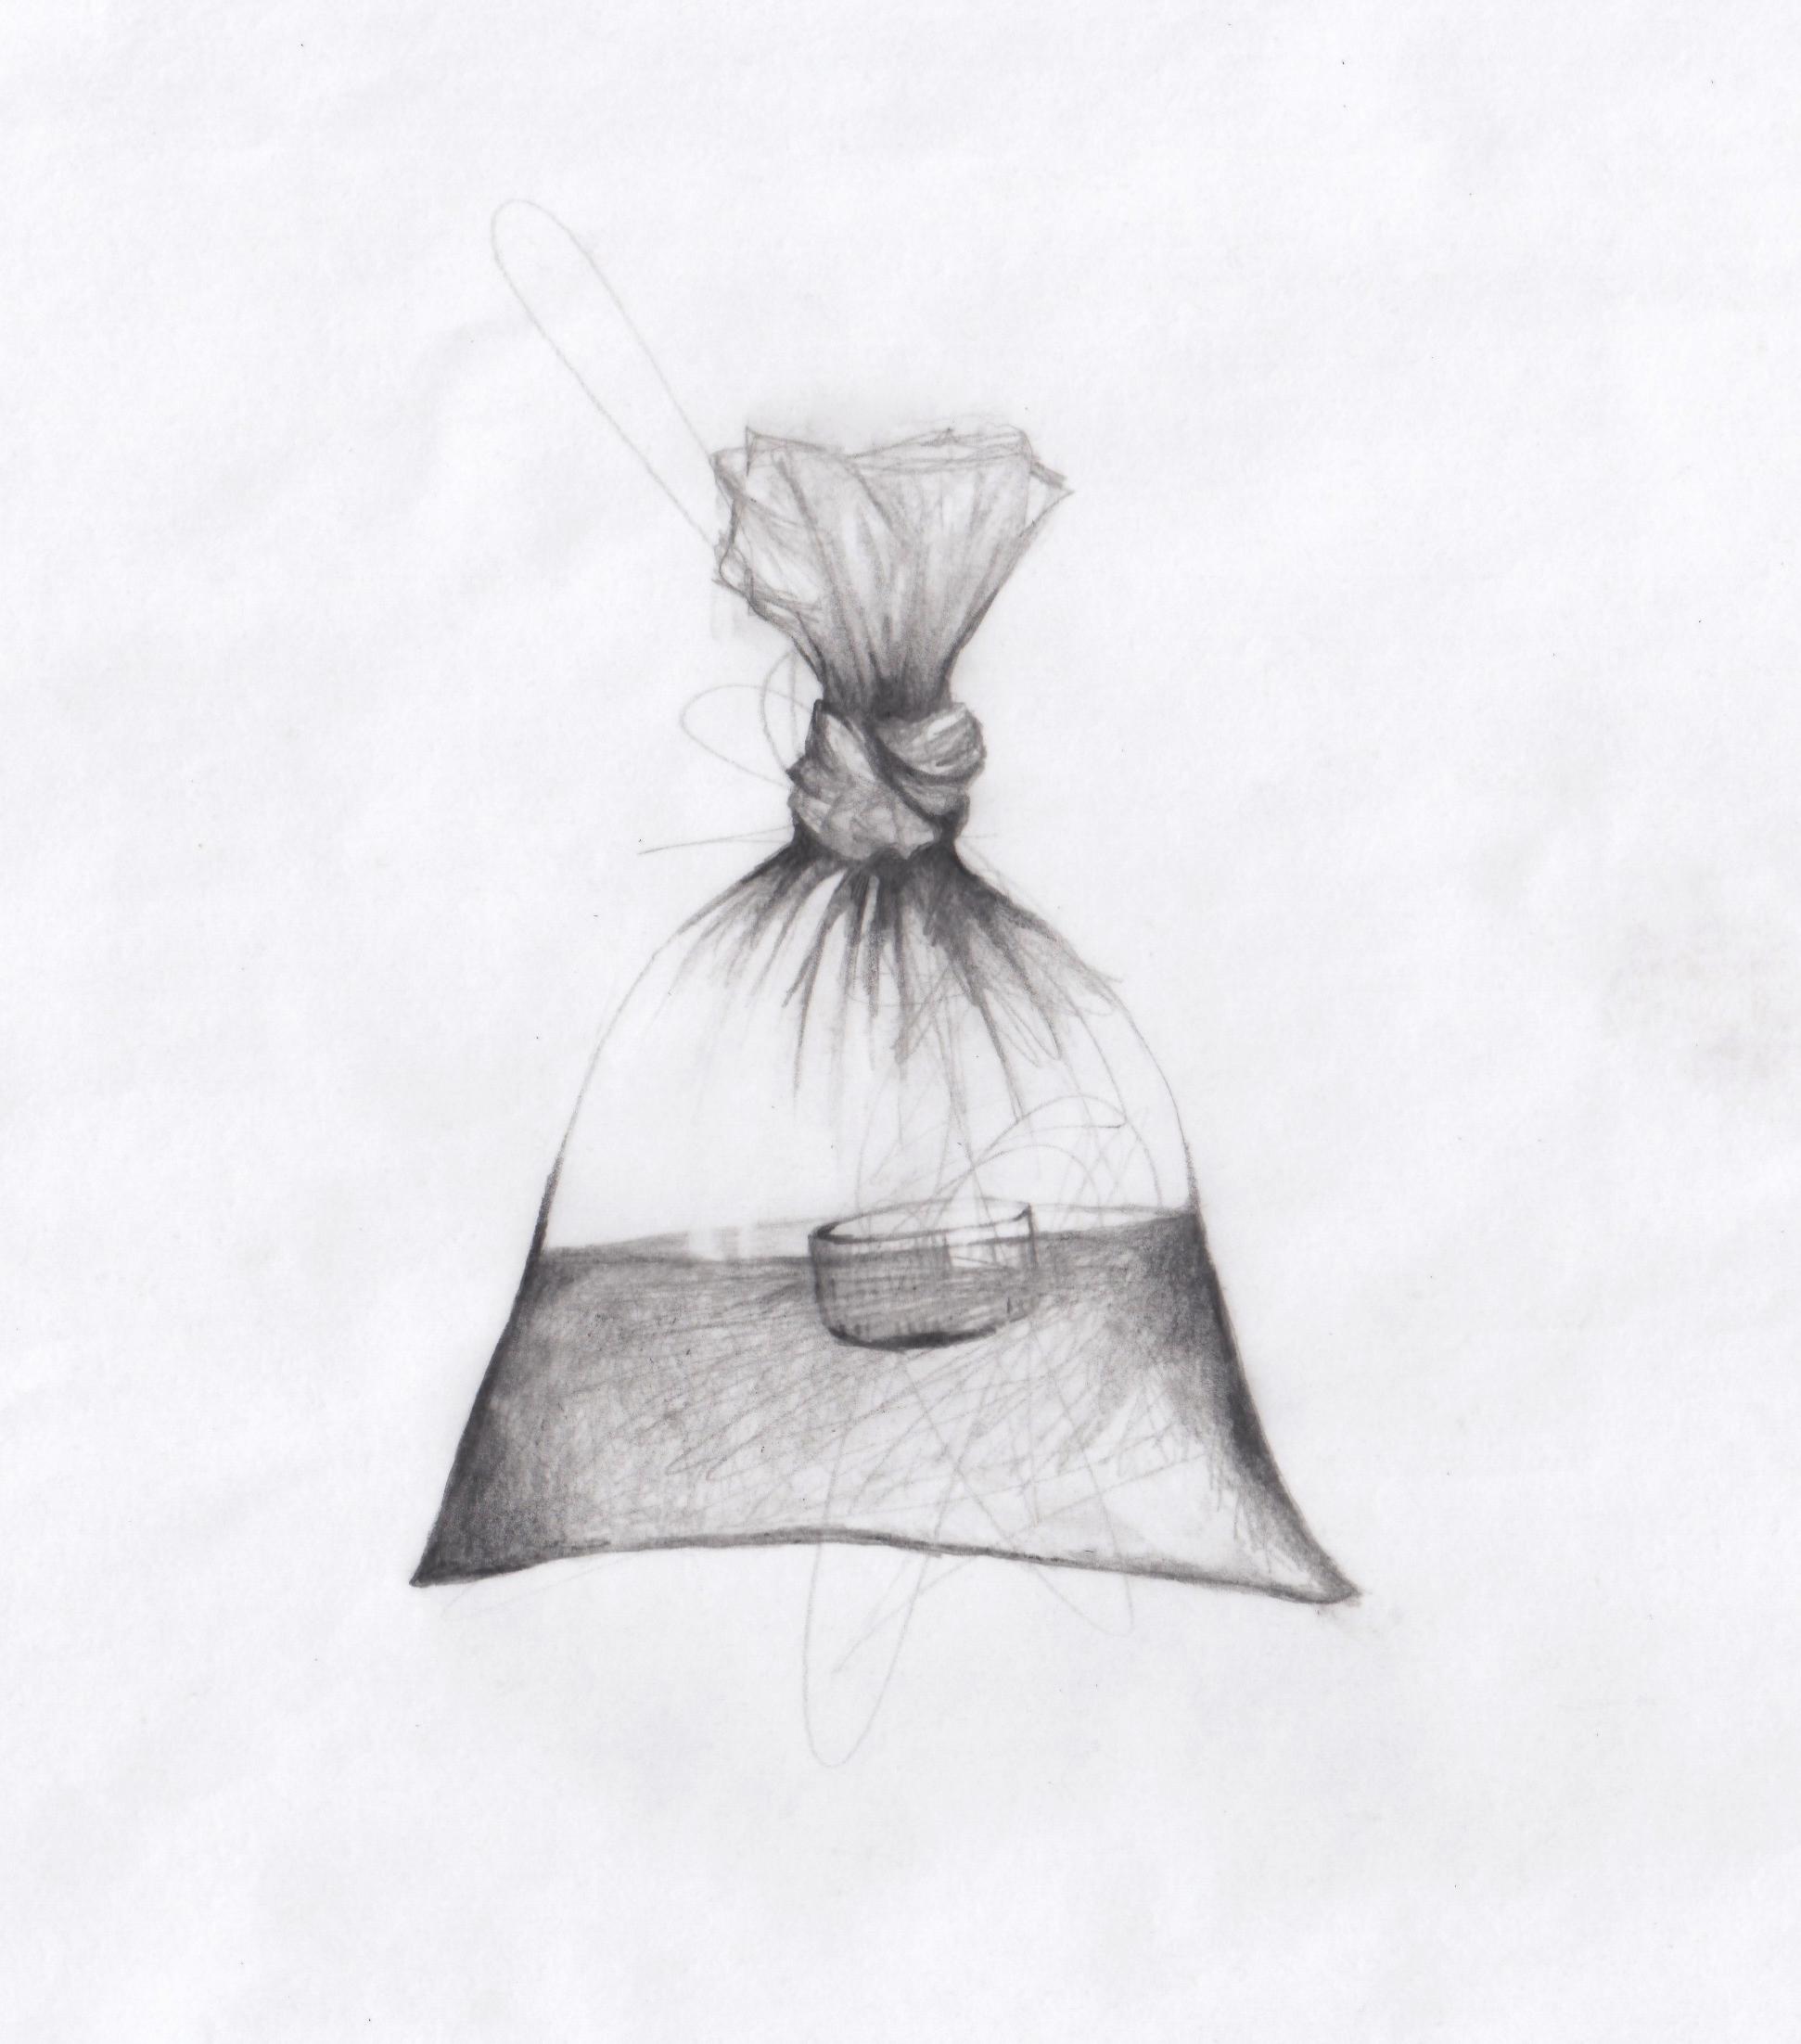 Pet Fish Bottle Cap in a Bag